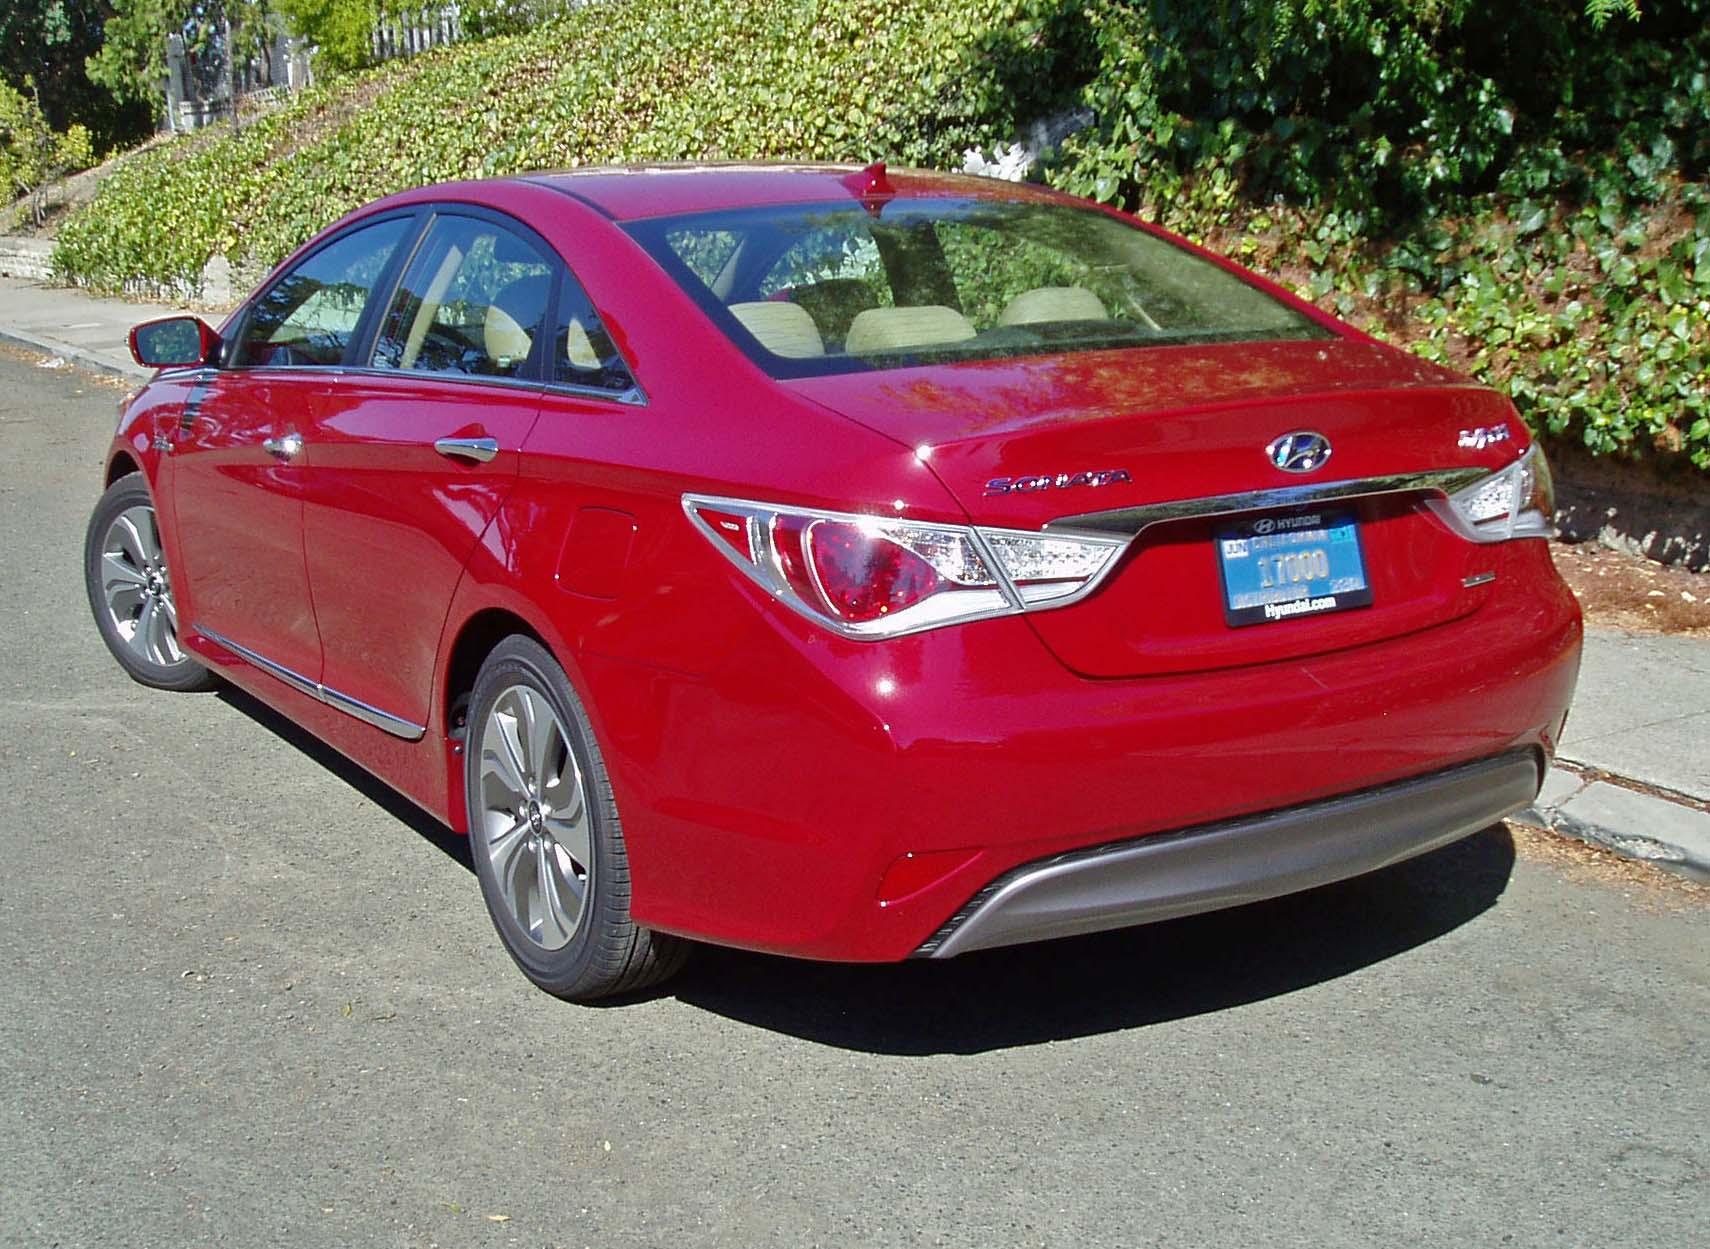 2013 Hyundai Sonata Hybrid Limited Test Drive Our Auto